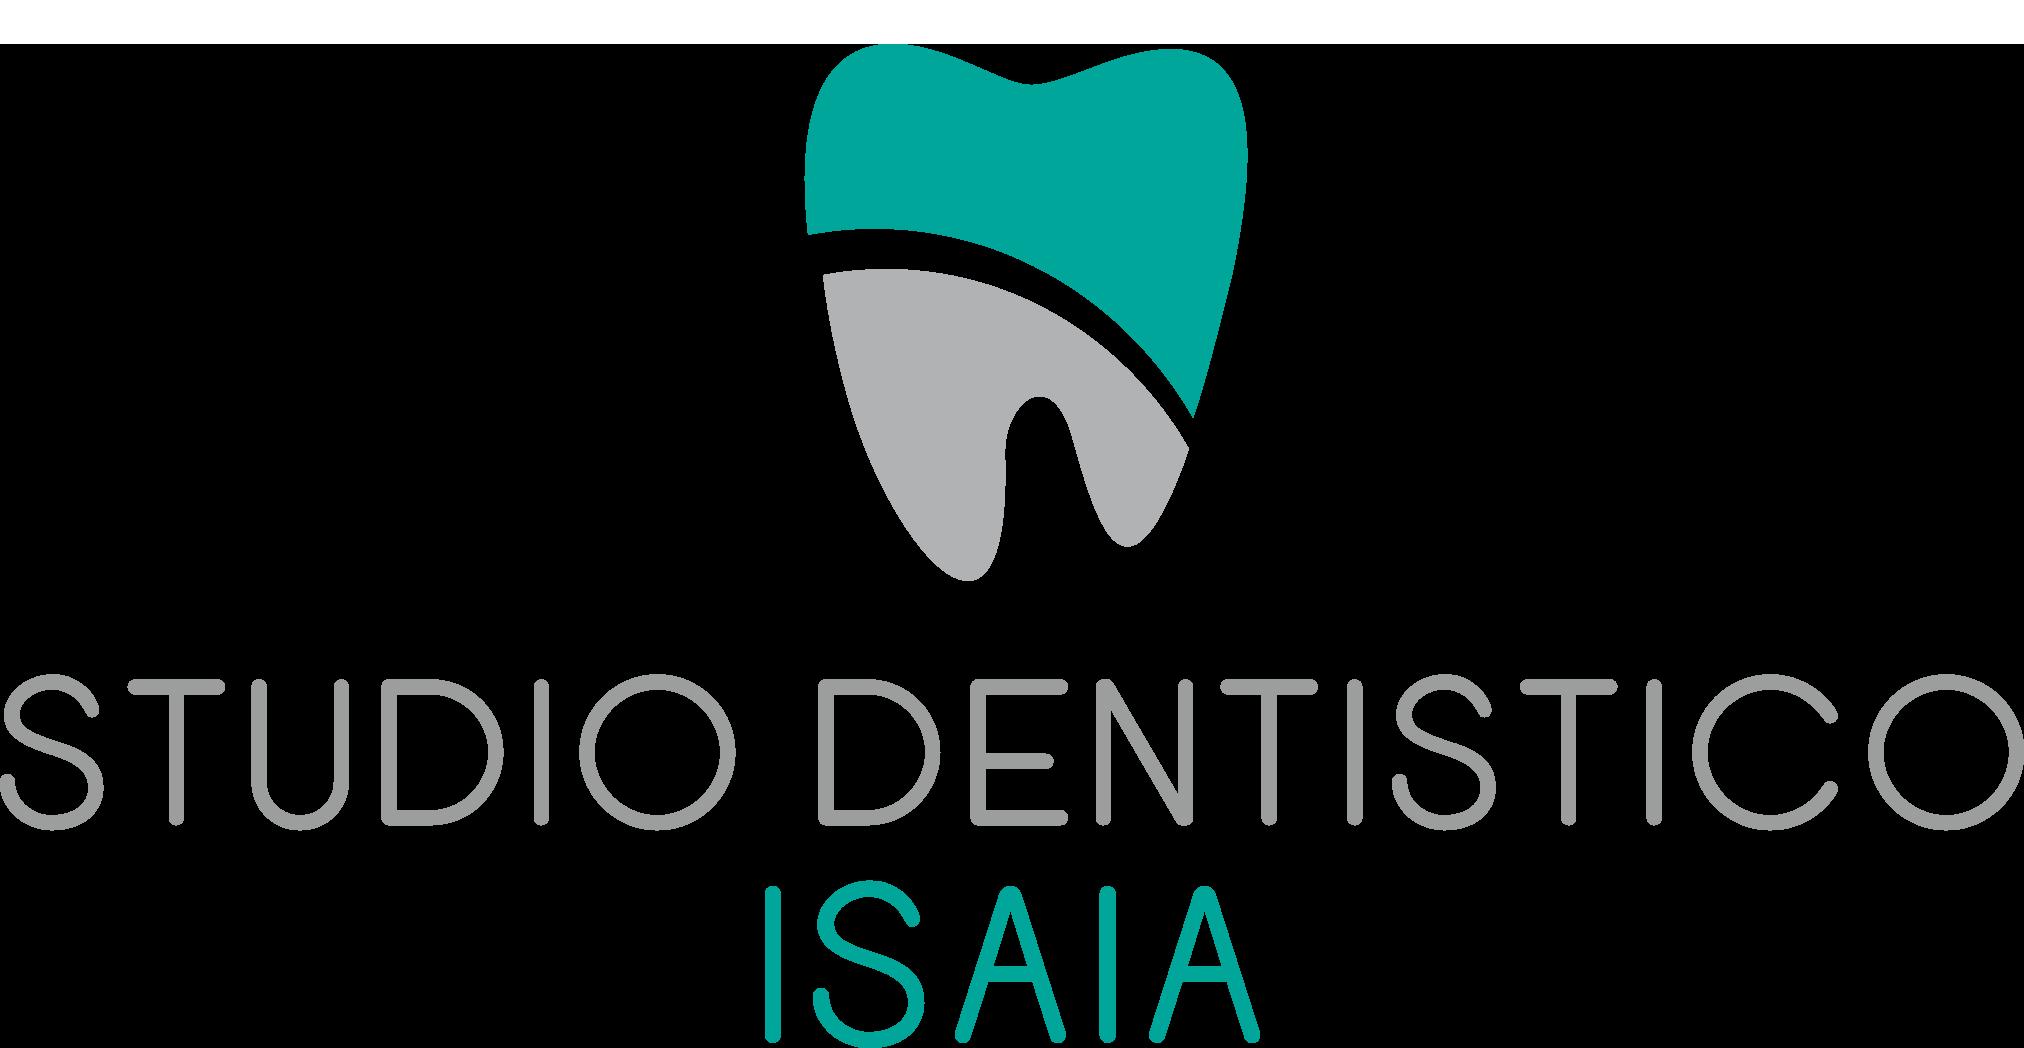 Studio Dentistico Isaia